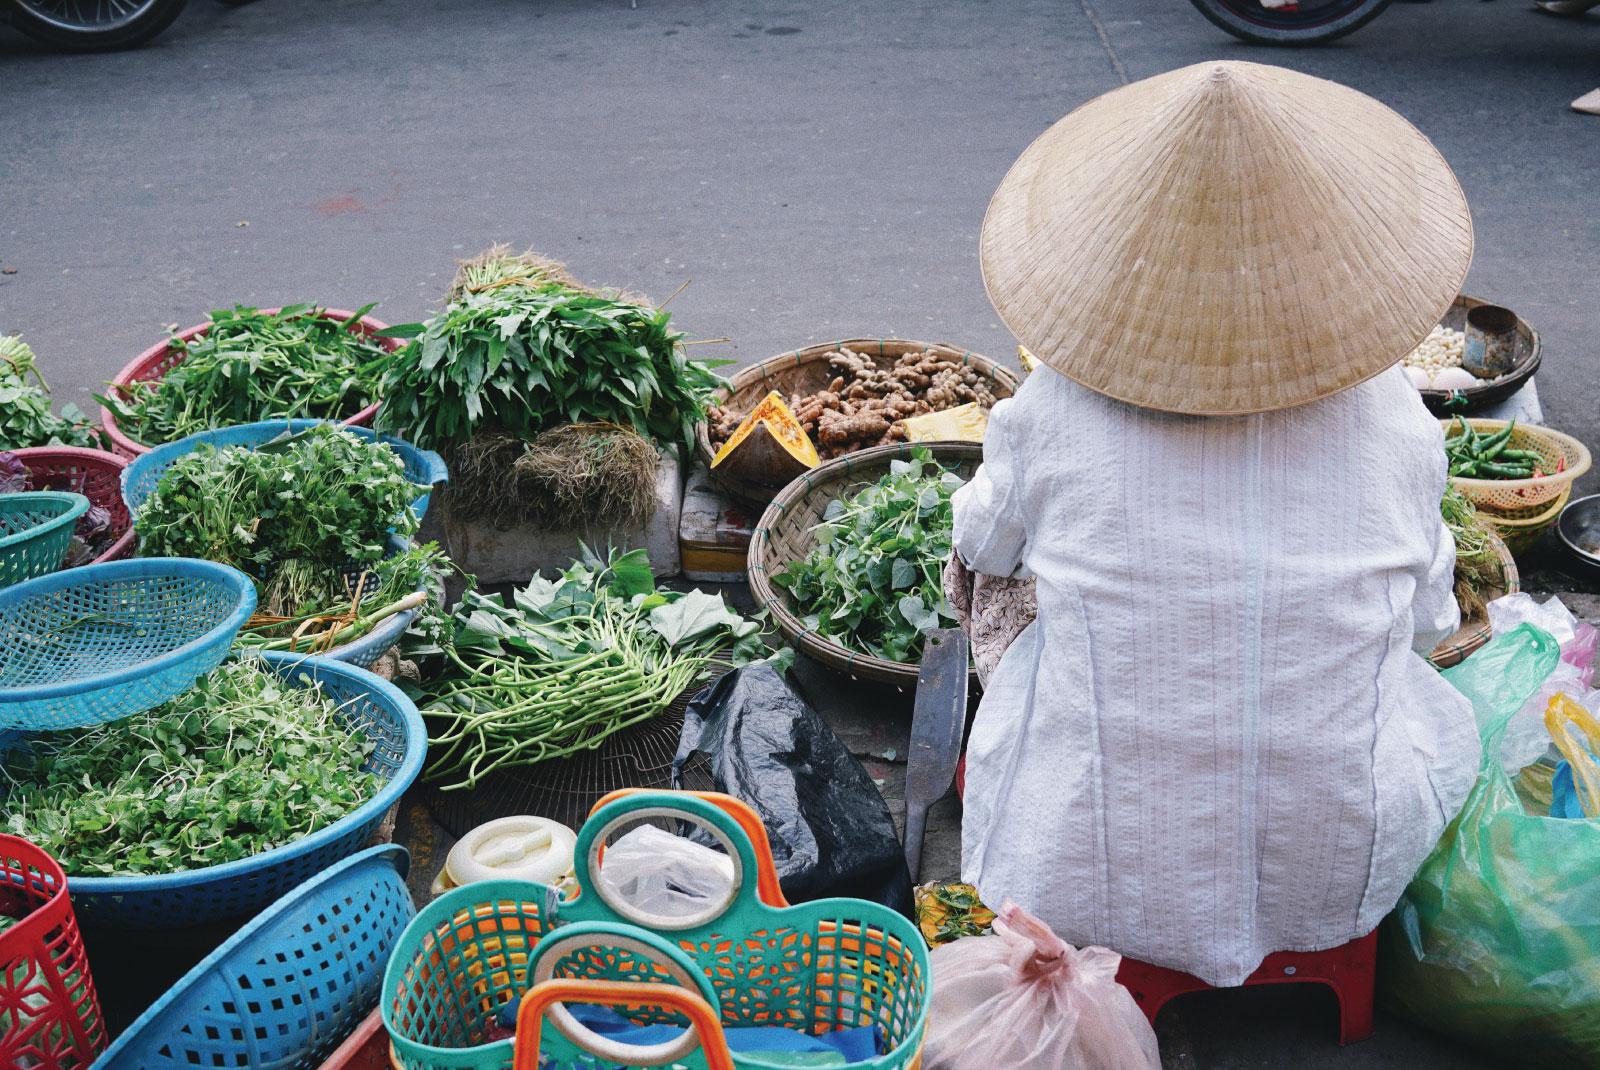 eternally-en-route-hoi-an-vietnam-33.jpg